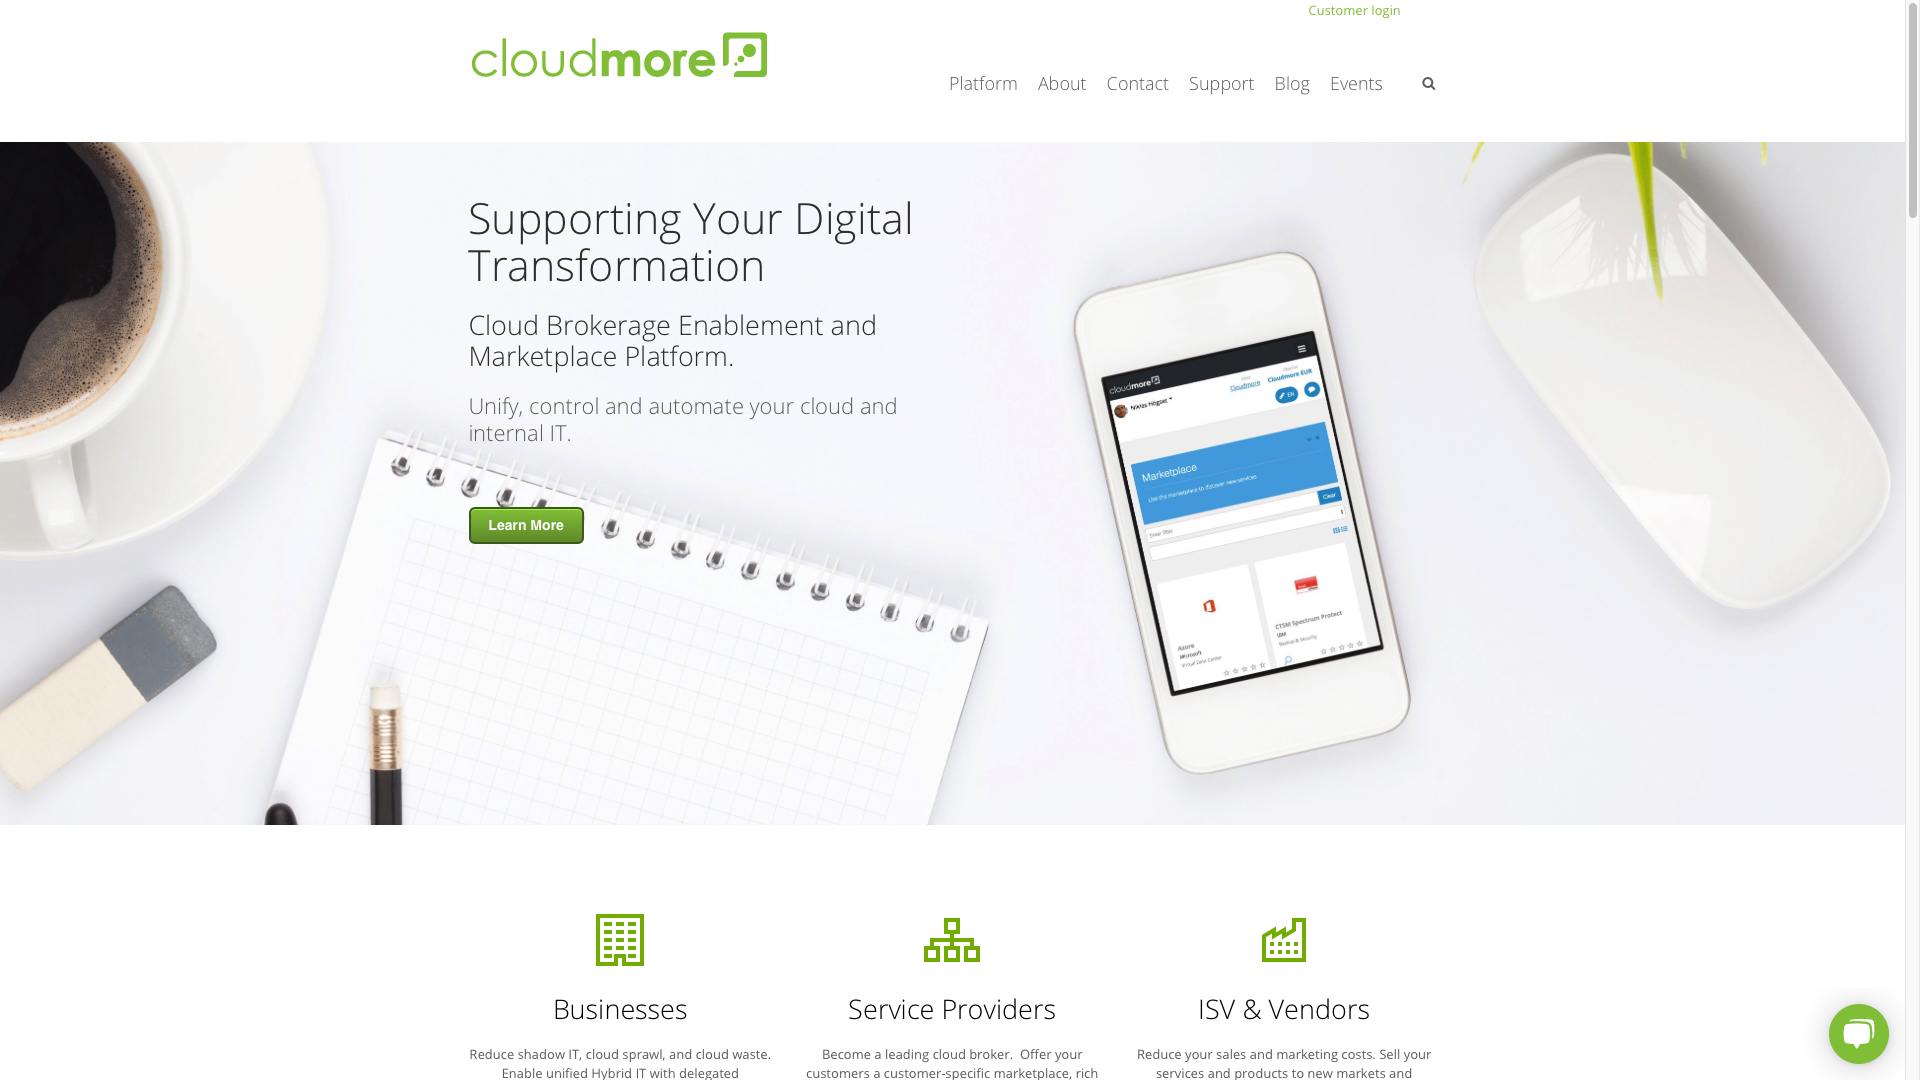 Cloudmore